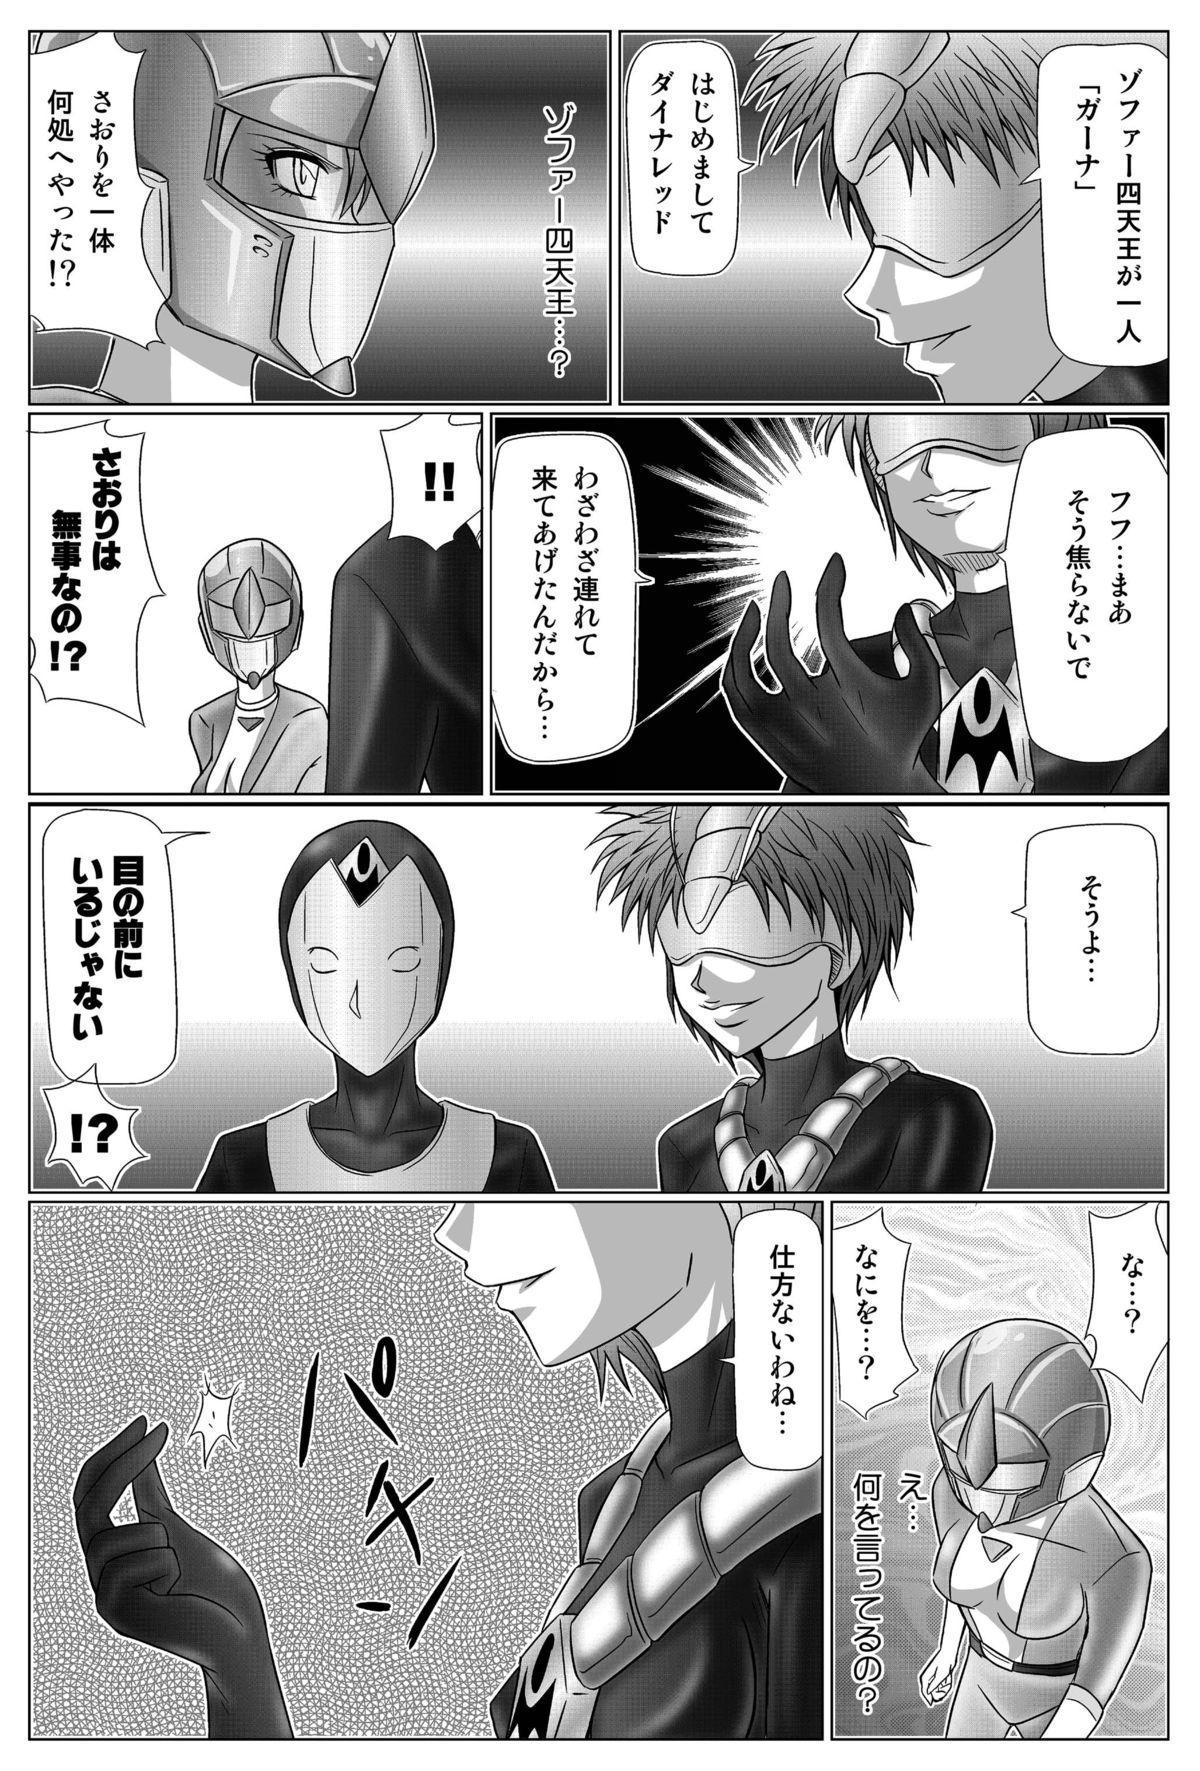 [Macxe's (monmon)] Tokubousentai Dinaranger ~Heroine Kairaku Sennou Keikaku~ Vol.01/02/03 (Renkaban) [Digital] 147